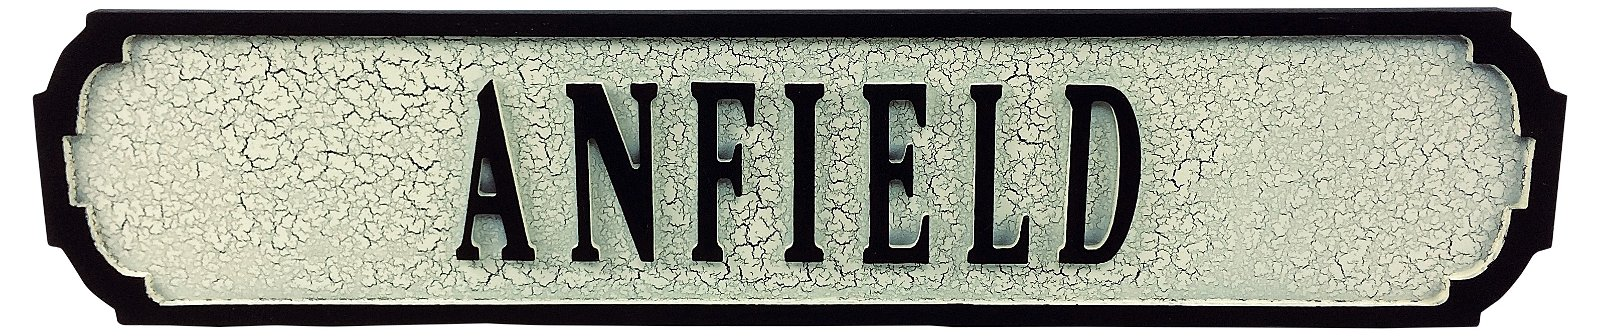 Anfield Road Sign 80cmx15cmx1.5cm